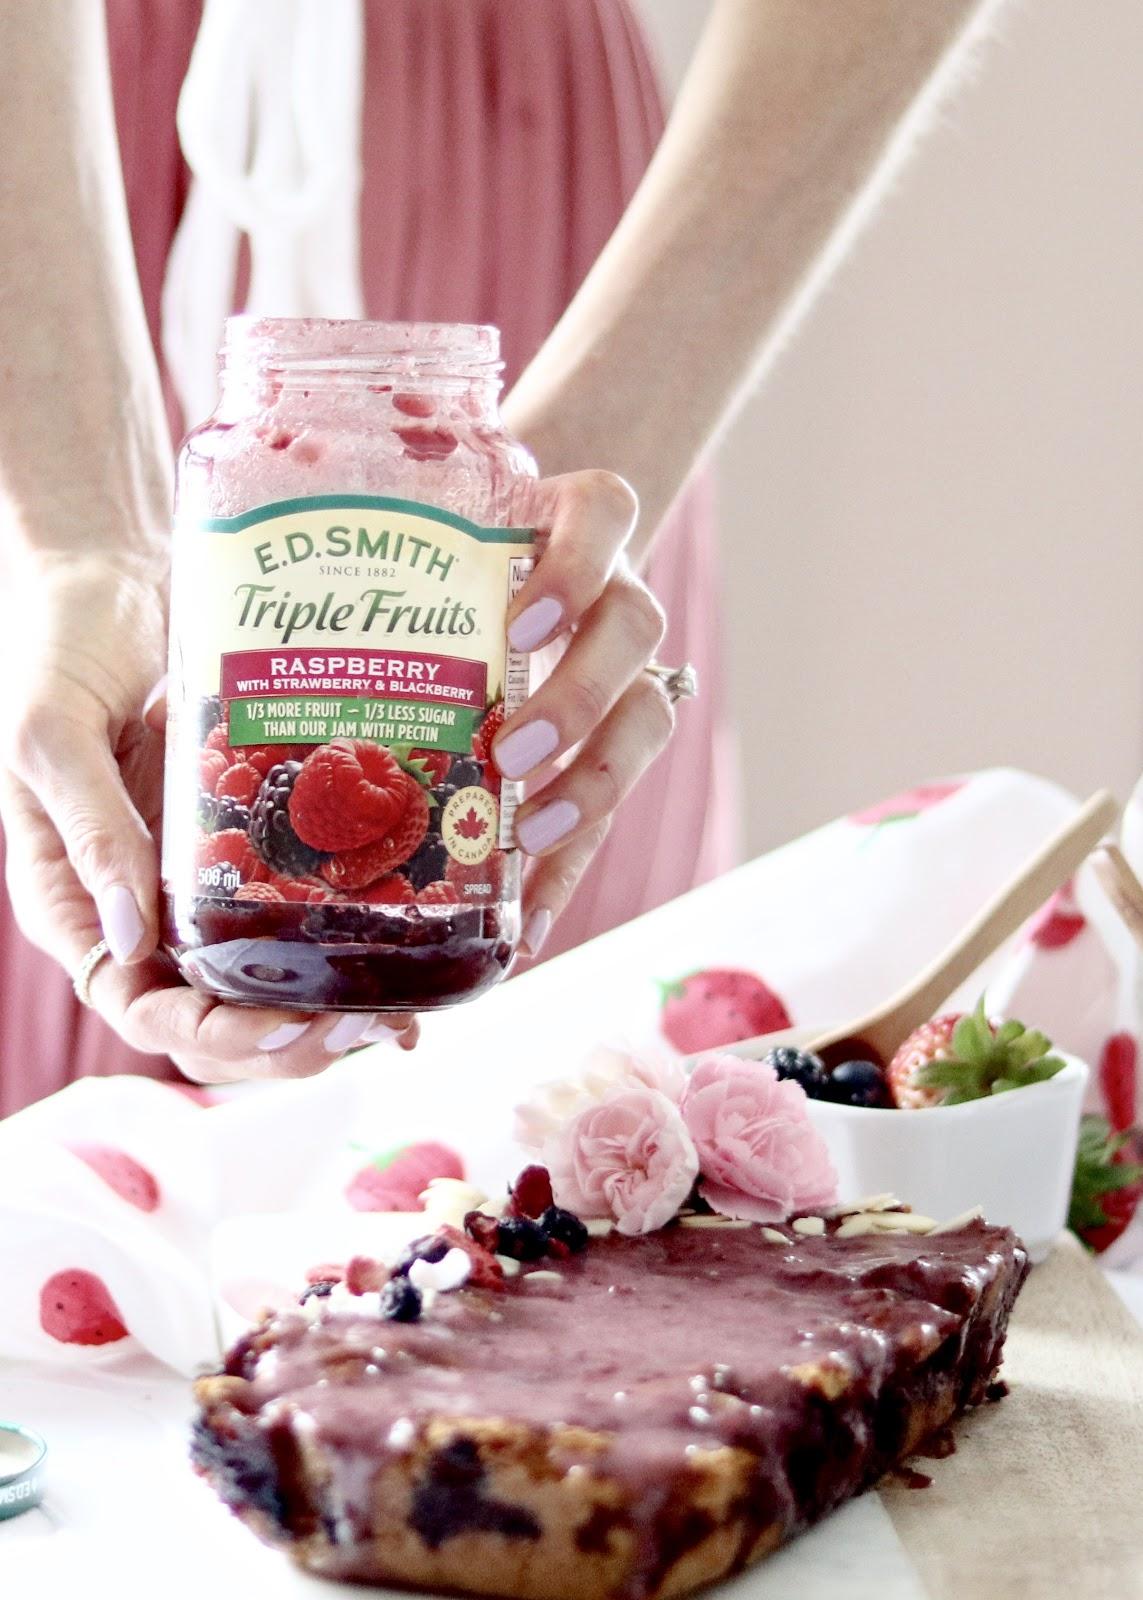 E.D. Smith Triple Berry Jam to make Spring dessert- Gluten Free Berry Loaf with Berry Glaze